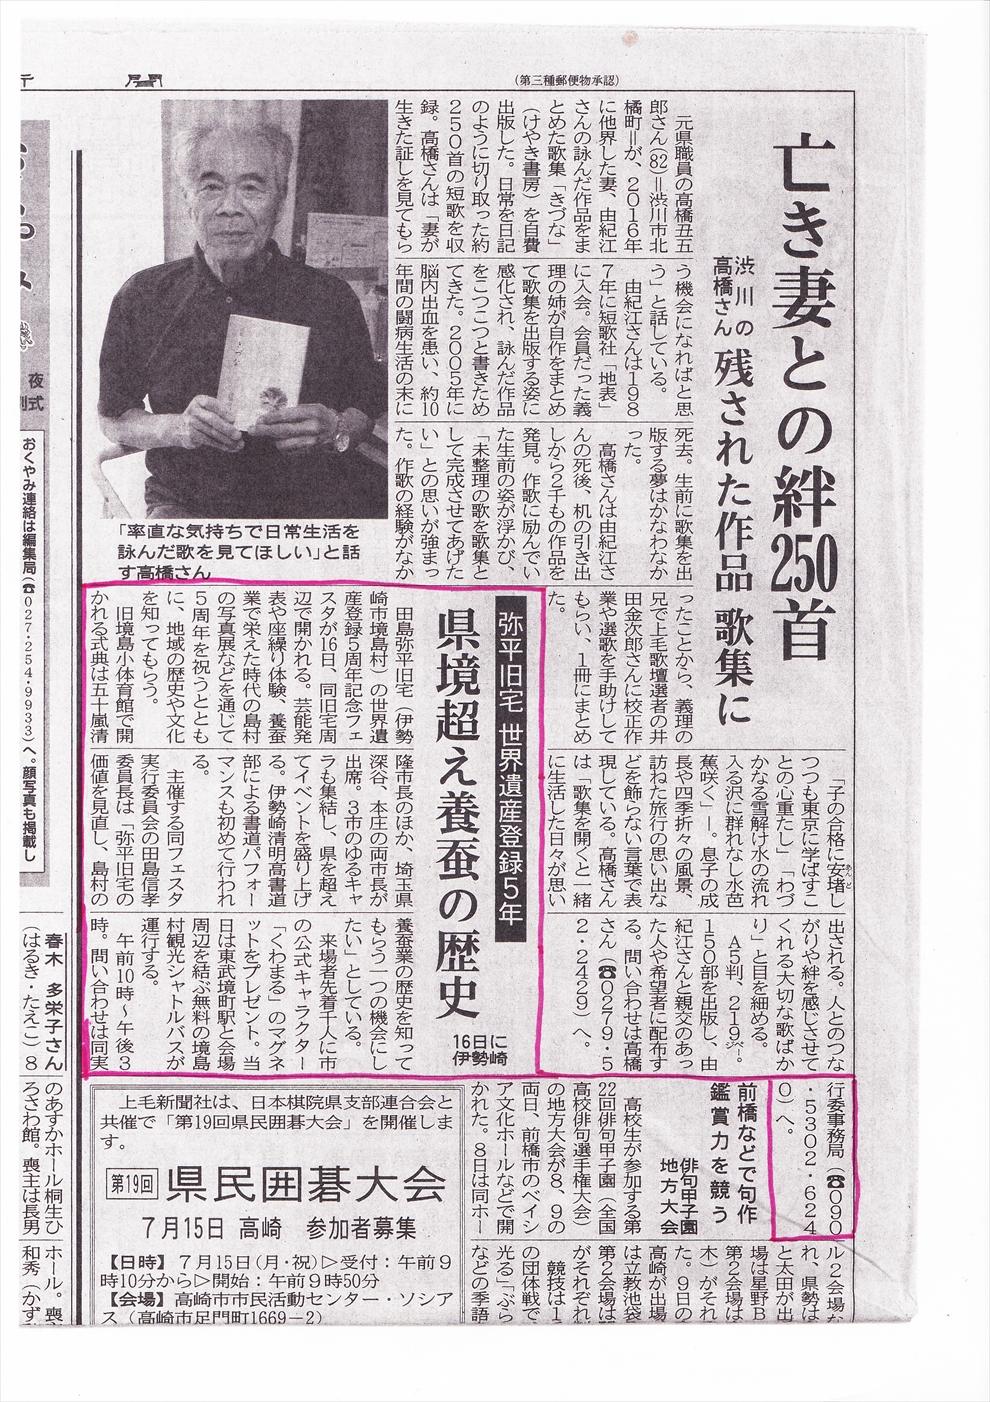 田島弥平旧宅の新聞記事